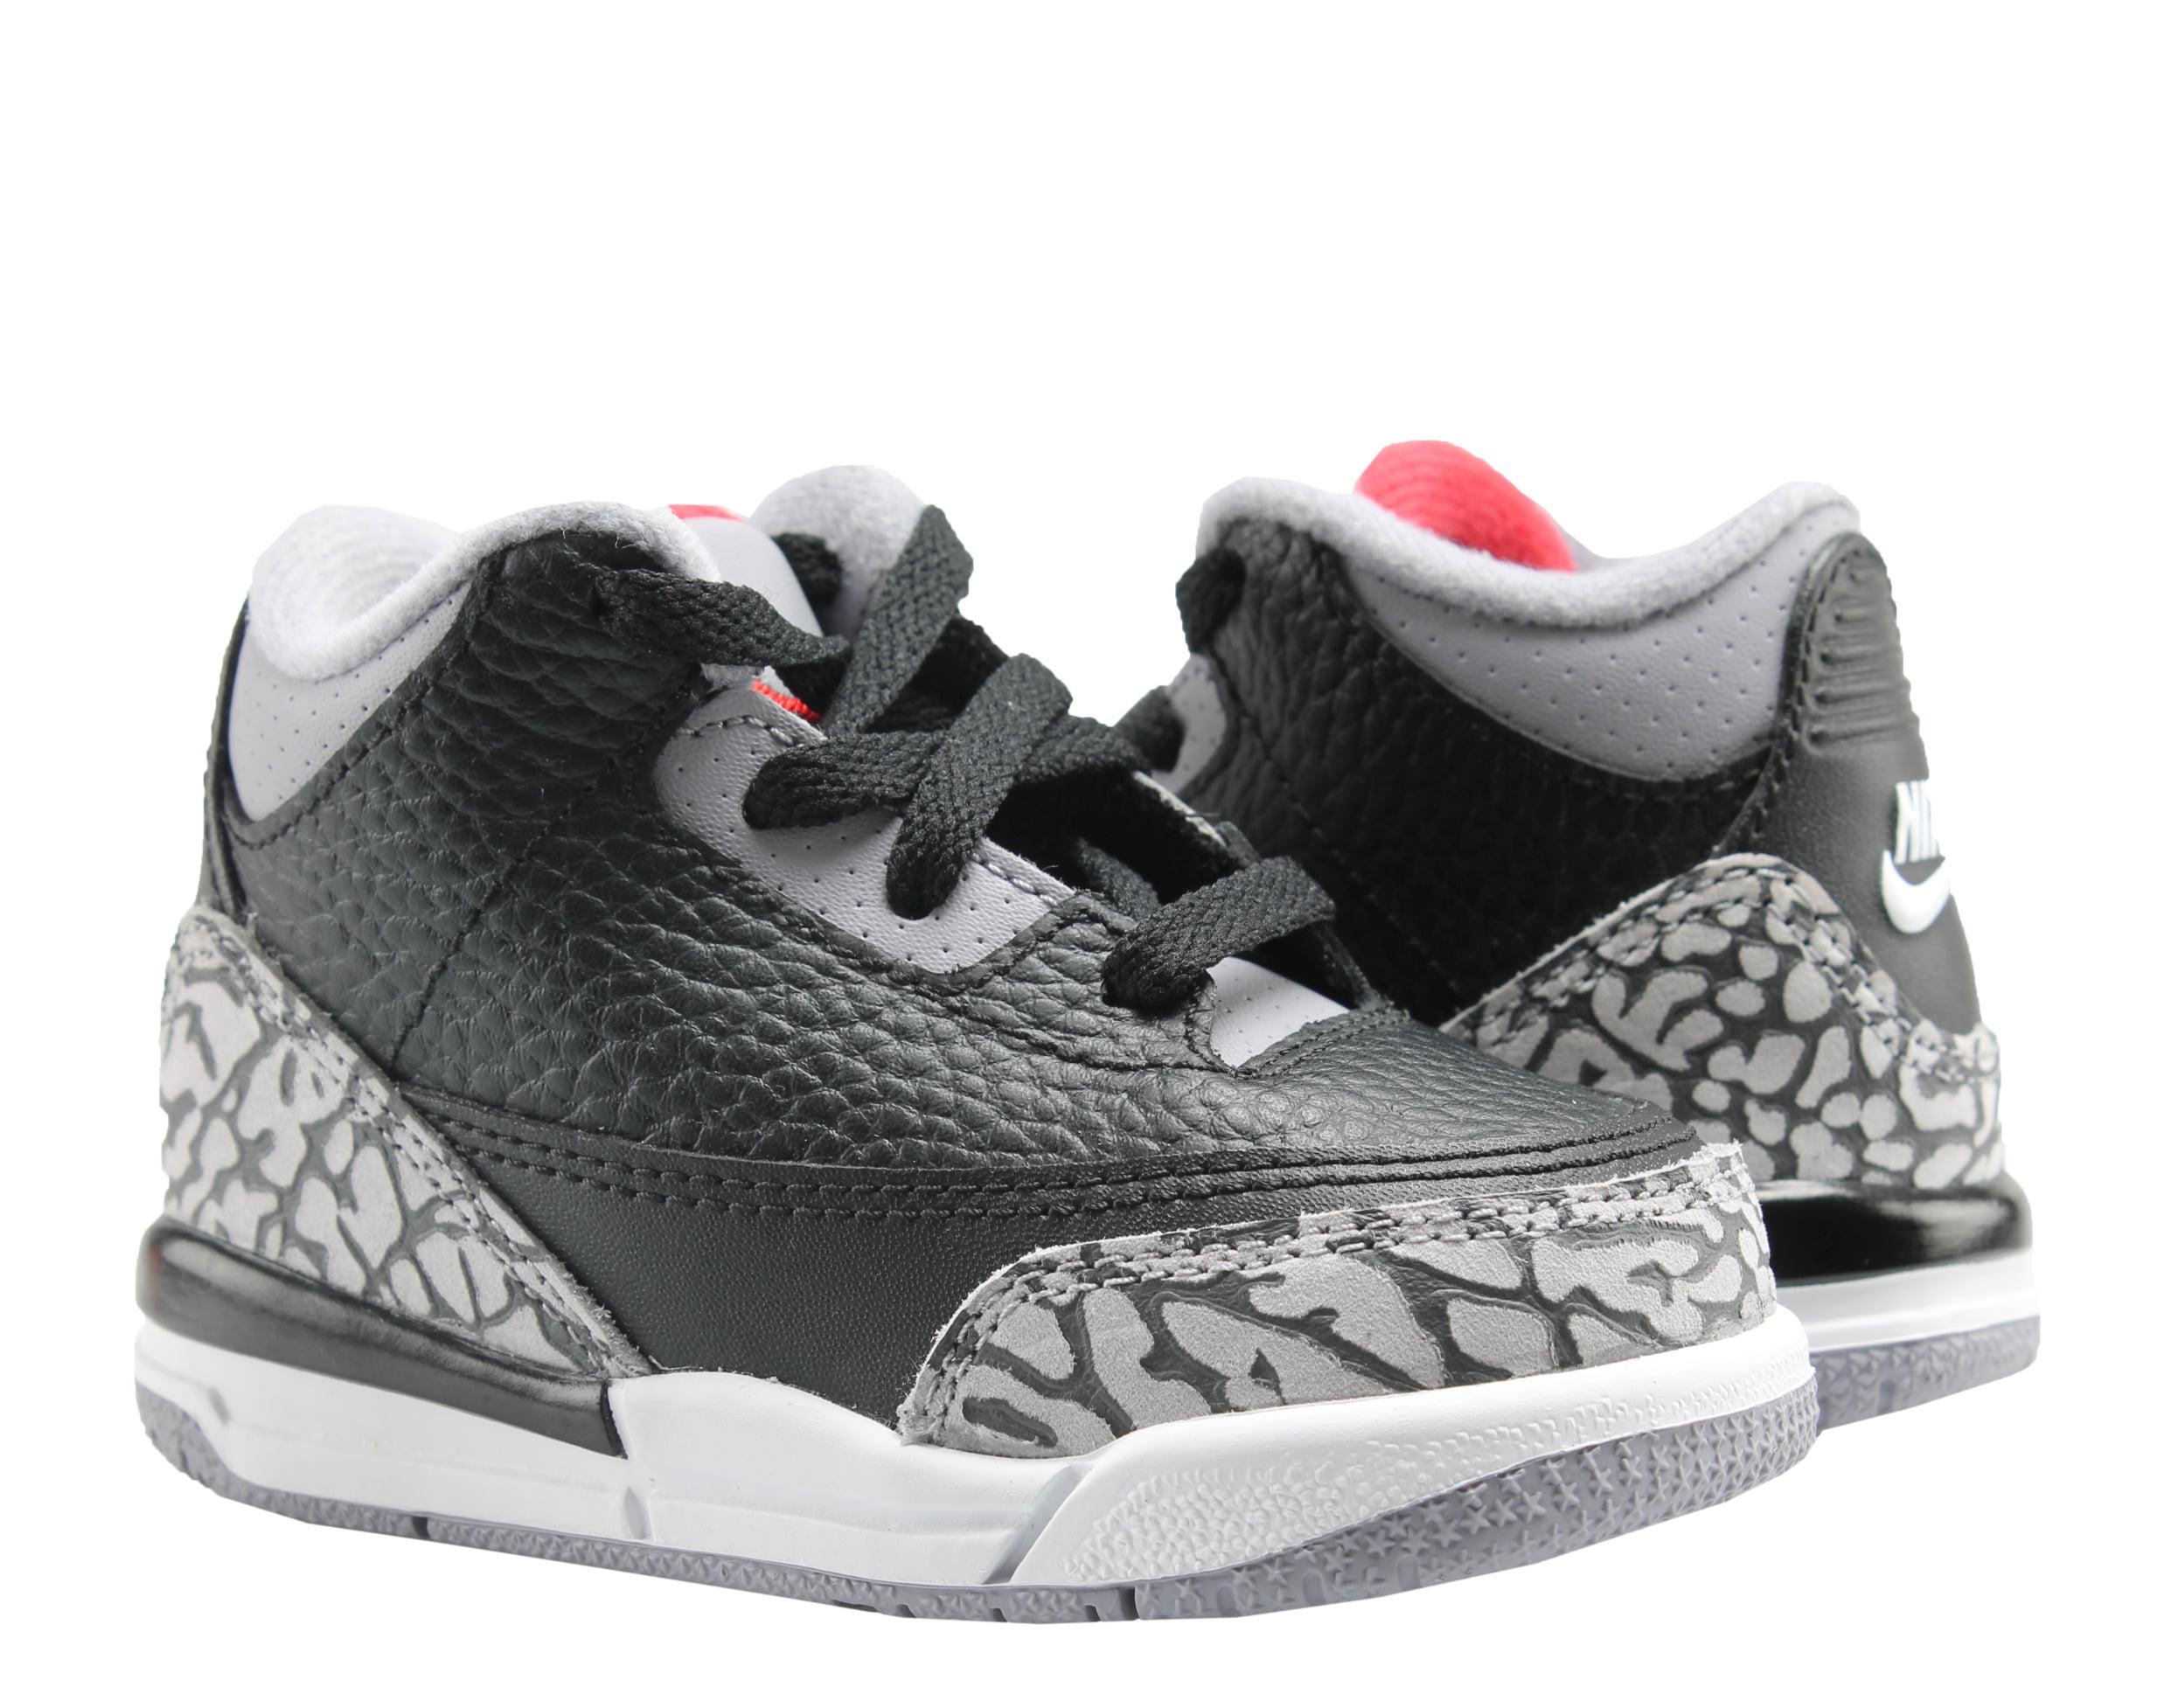 d6cfd285d18 ... wholesale nike air jordan 3 retro bt blk cement toddler kids basketball  shoes 832033 021 52562 ...